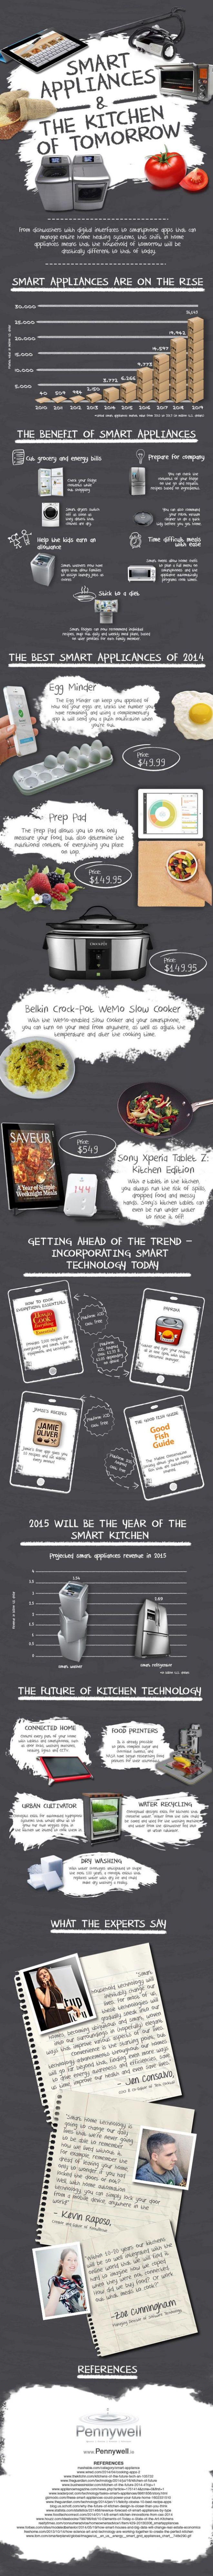 Smart-Kitchen-Appliances-Infographic